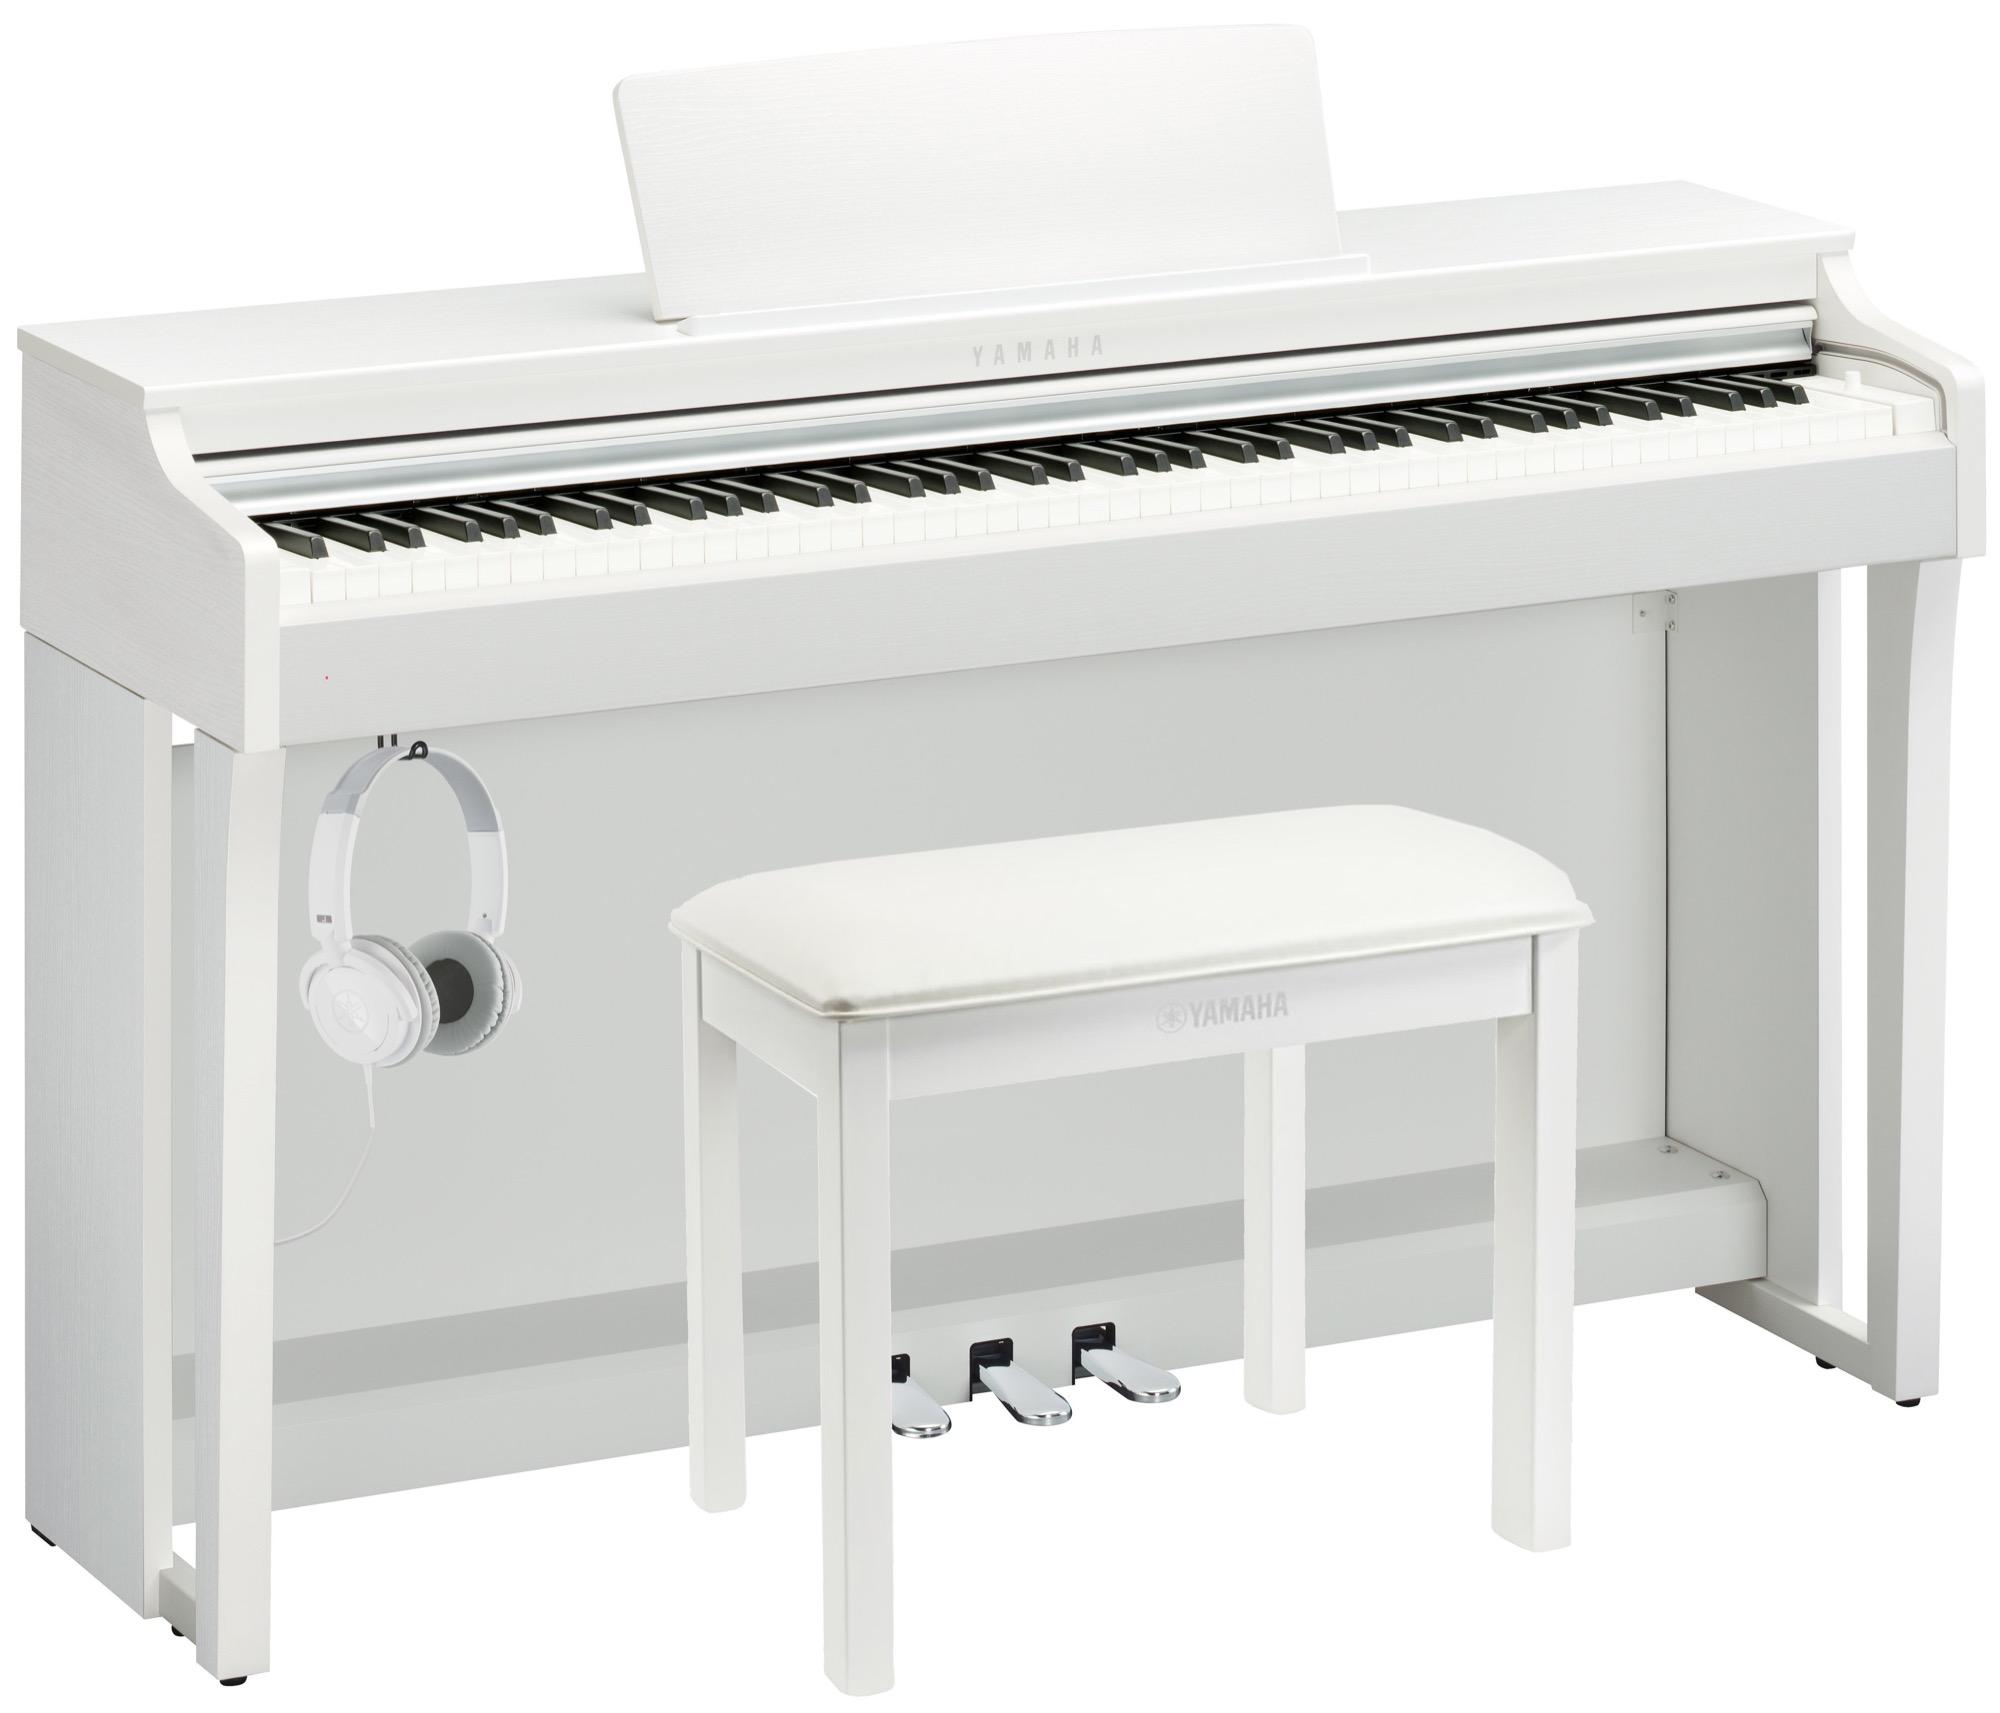 yamaha clp 625 deluxe clavinova piano pack in white finish white yamaha music london. Black Bedroom Furniture Sets. Home Design Ideas